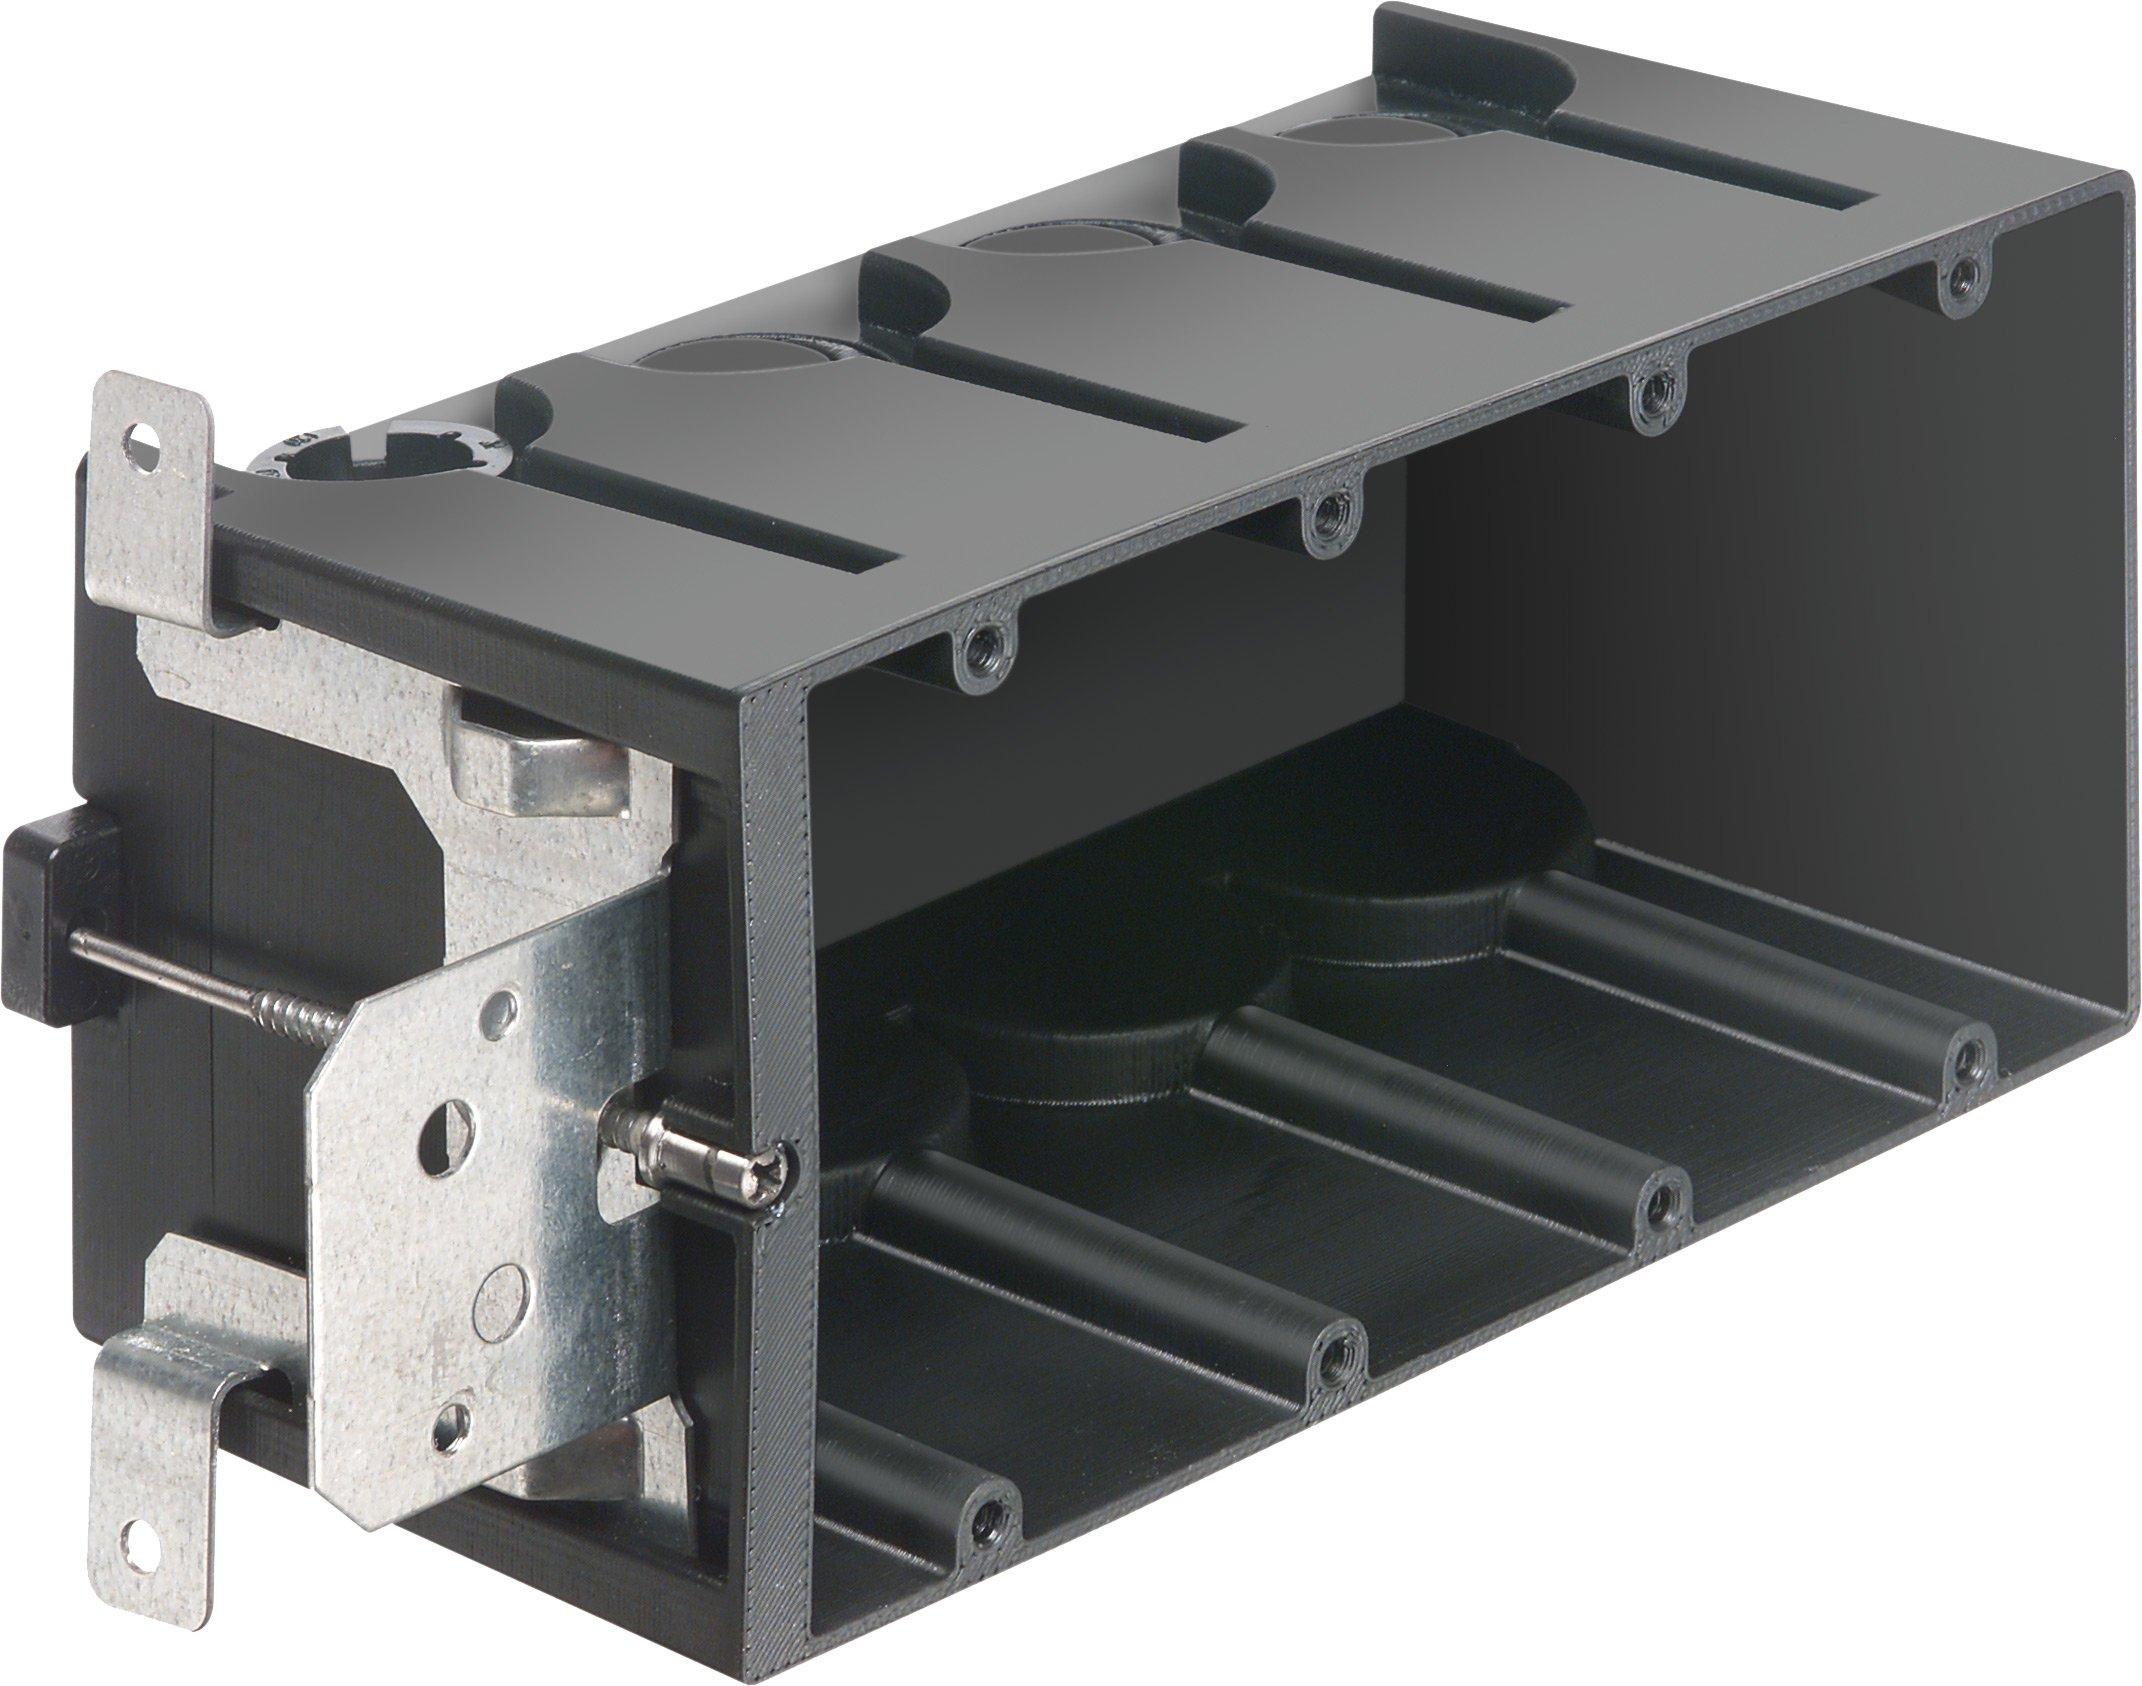 Arlington Industries FA104 4-Gang Adjustable Outlet Mount Box, 10-Pack